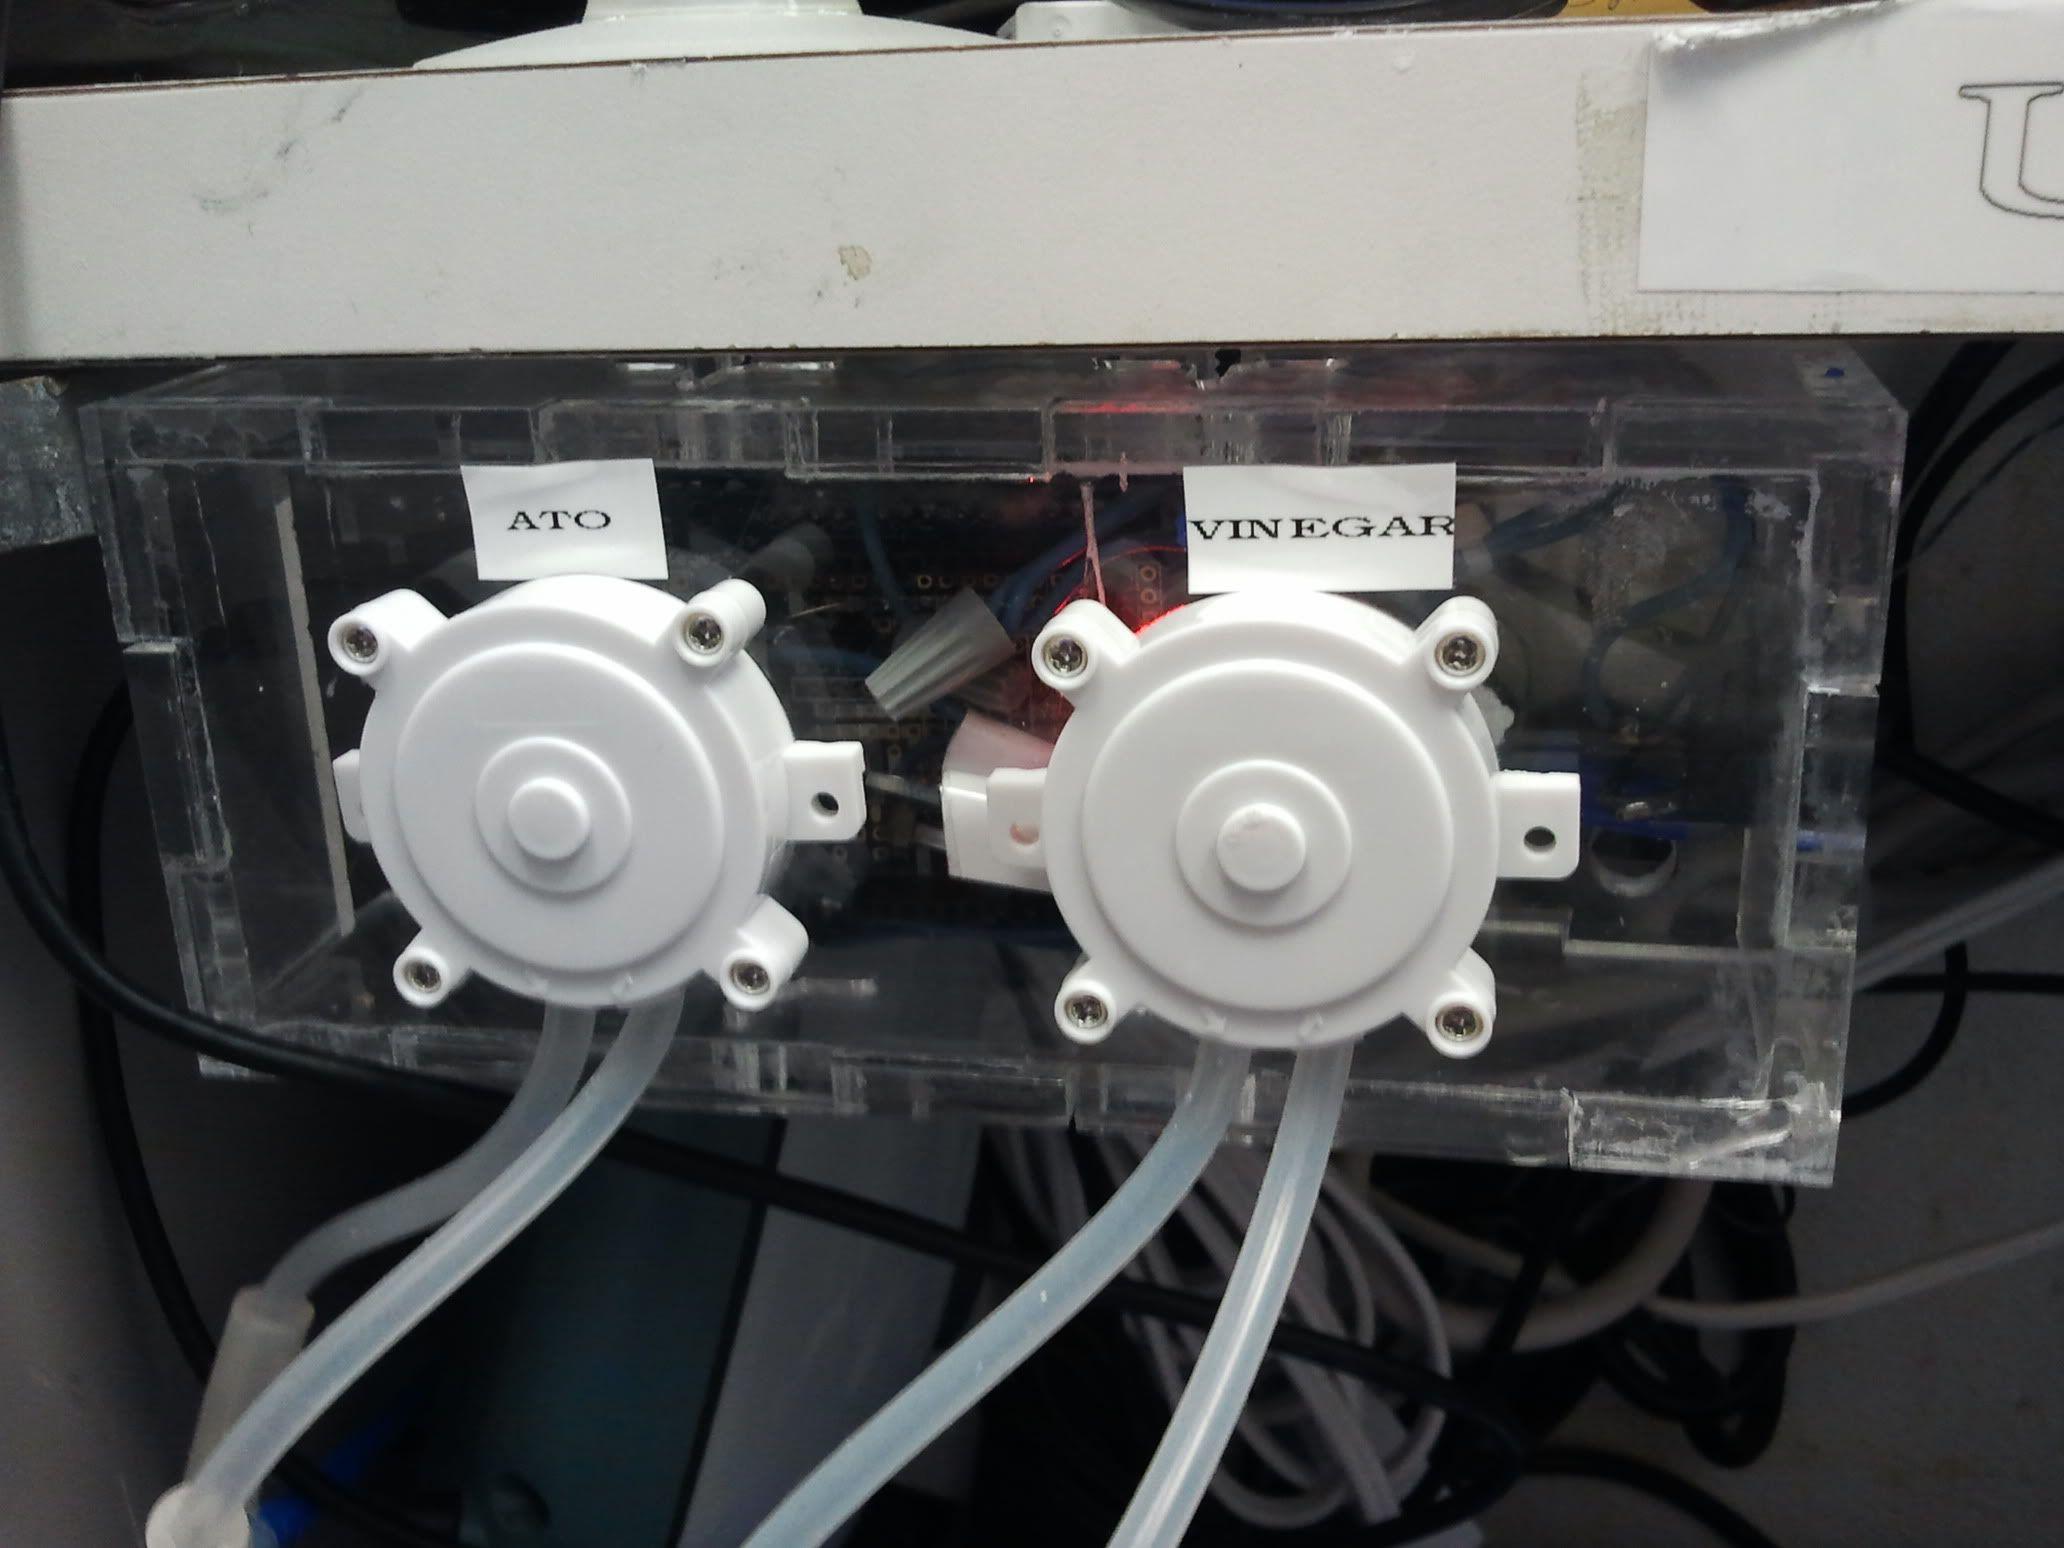 DIY Arduino Dosing pump | Tech | Arduino, Diy aquarium, Diy electronics